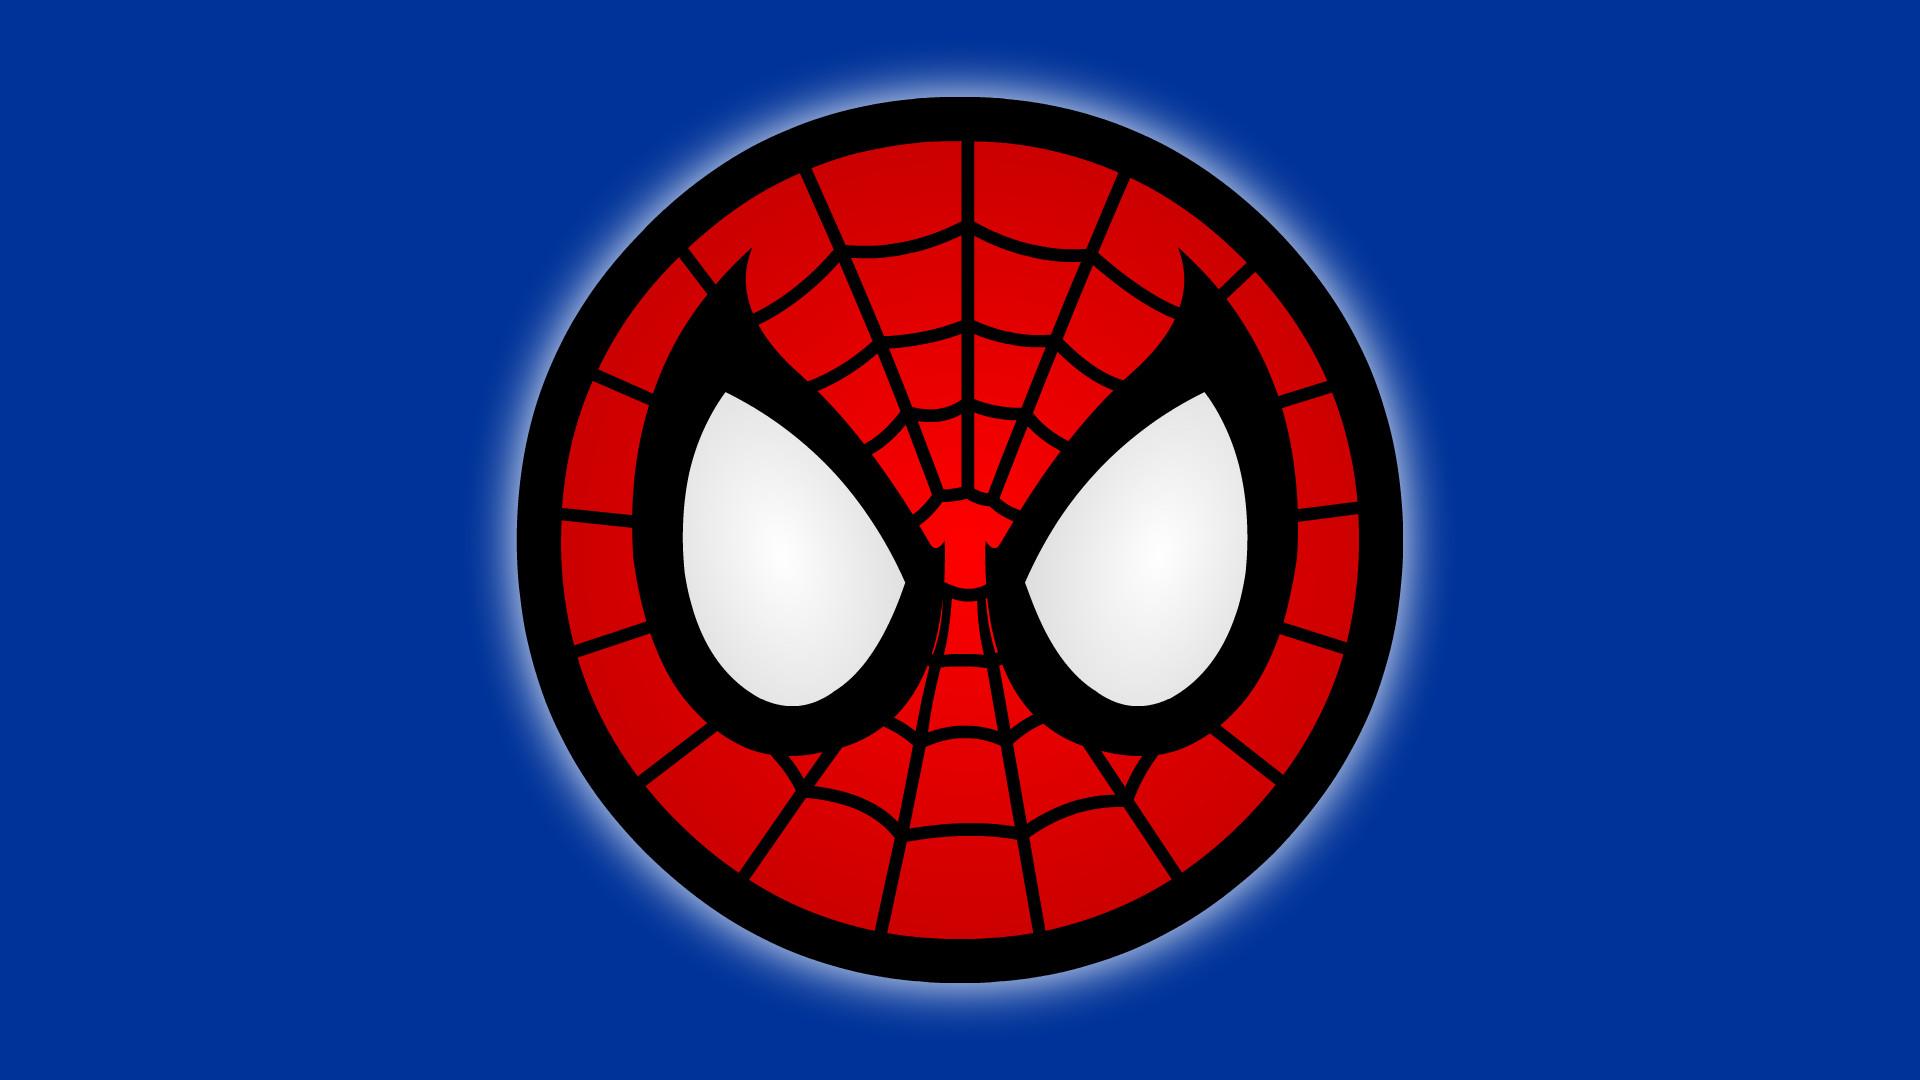 Spiderman logo - photo#36